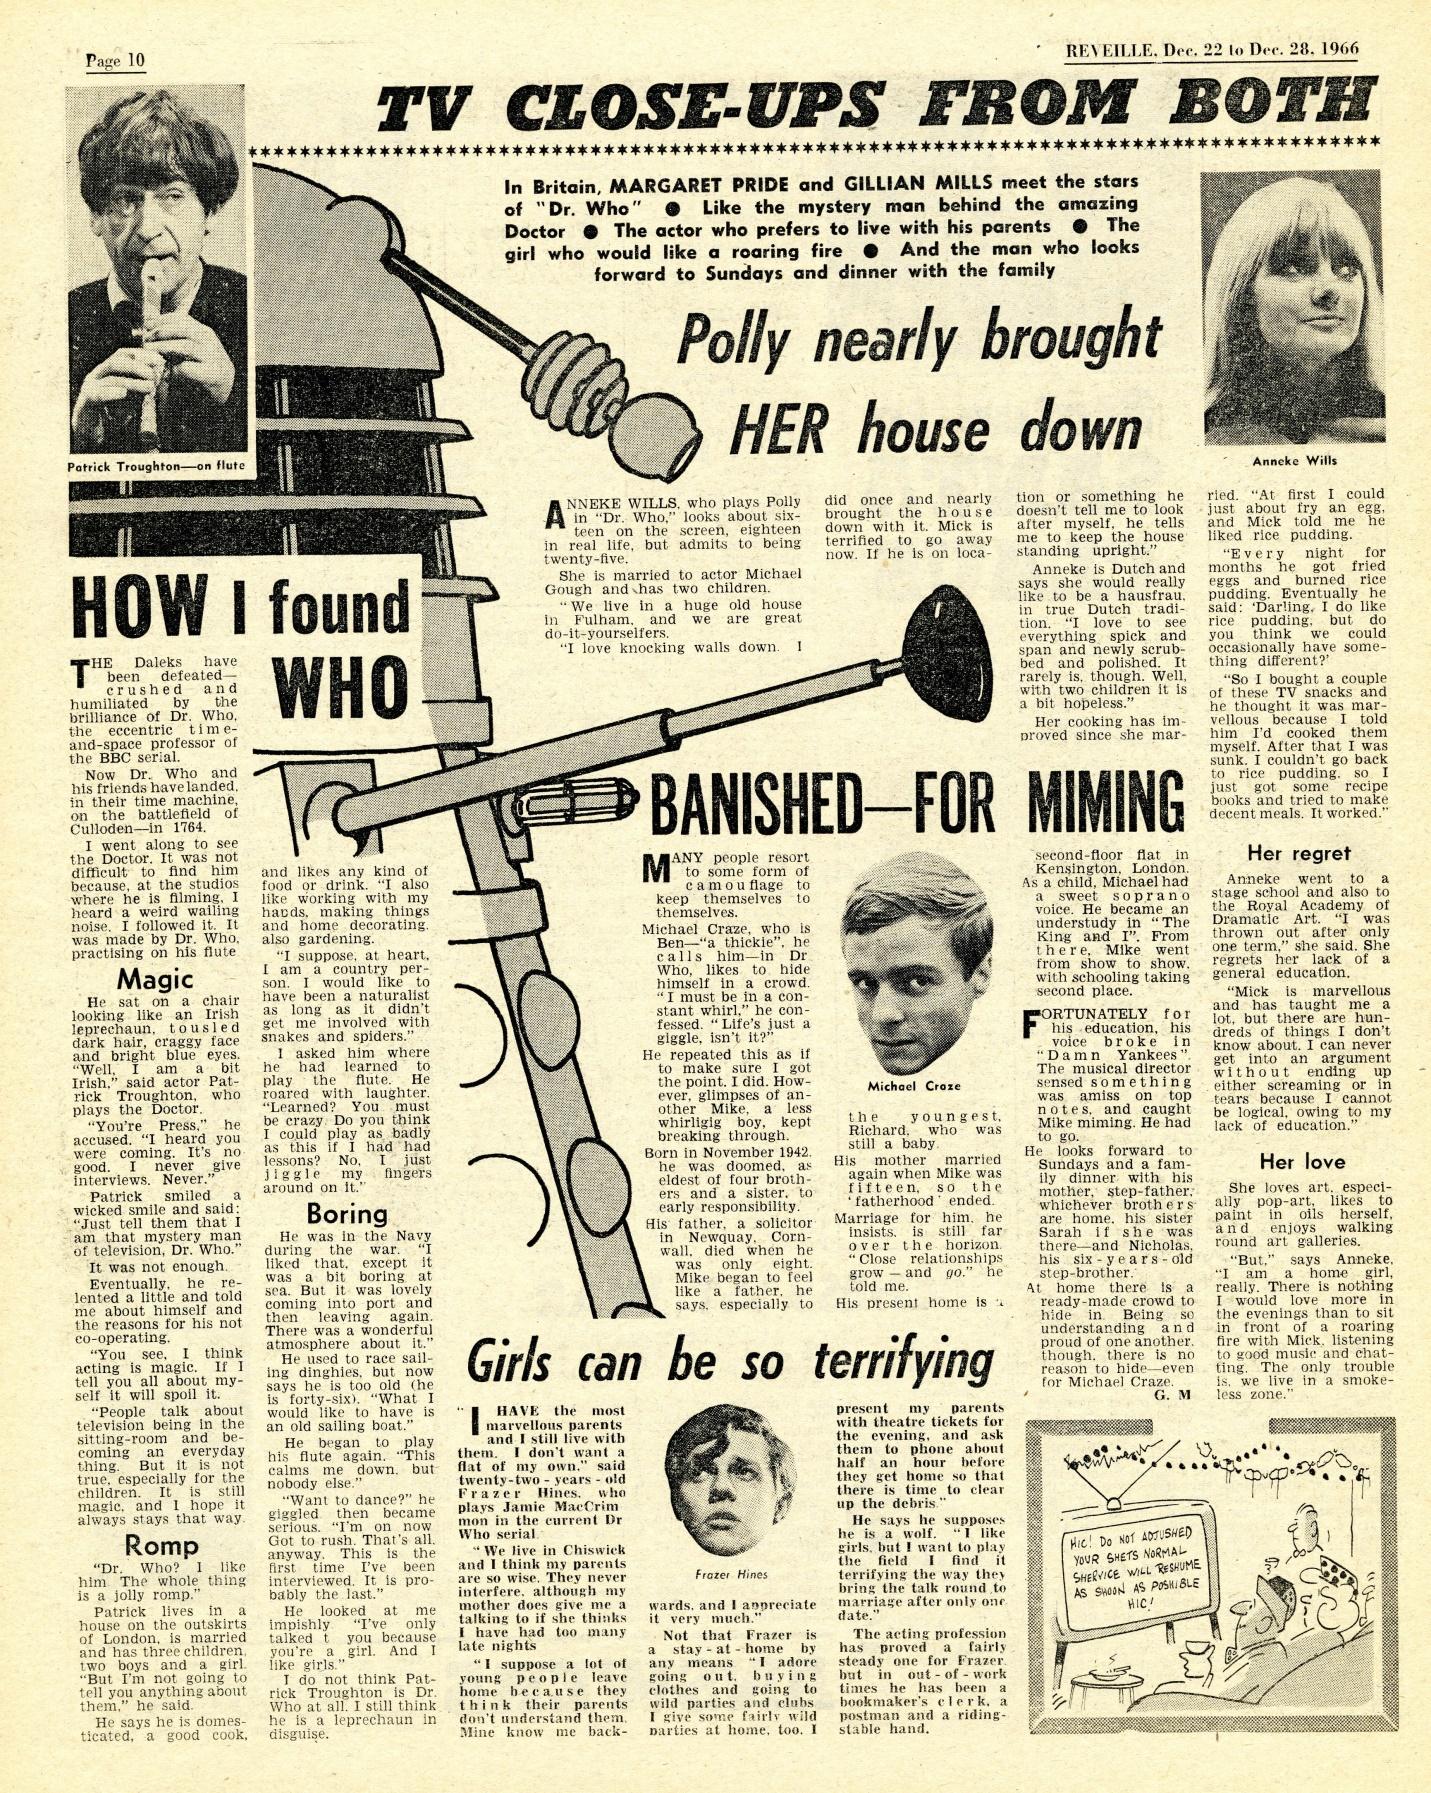 Reveille, 22-28 December 1966